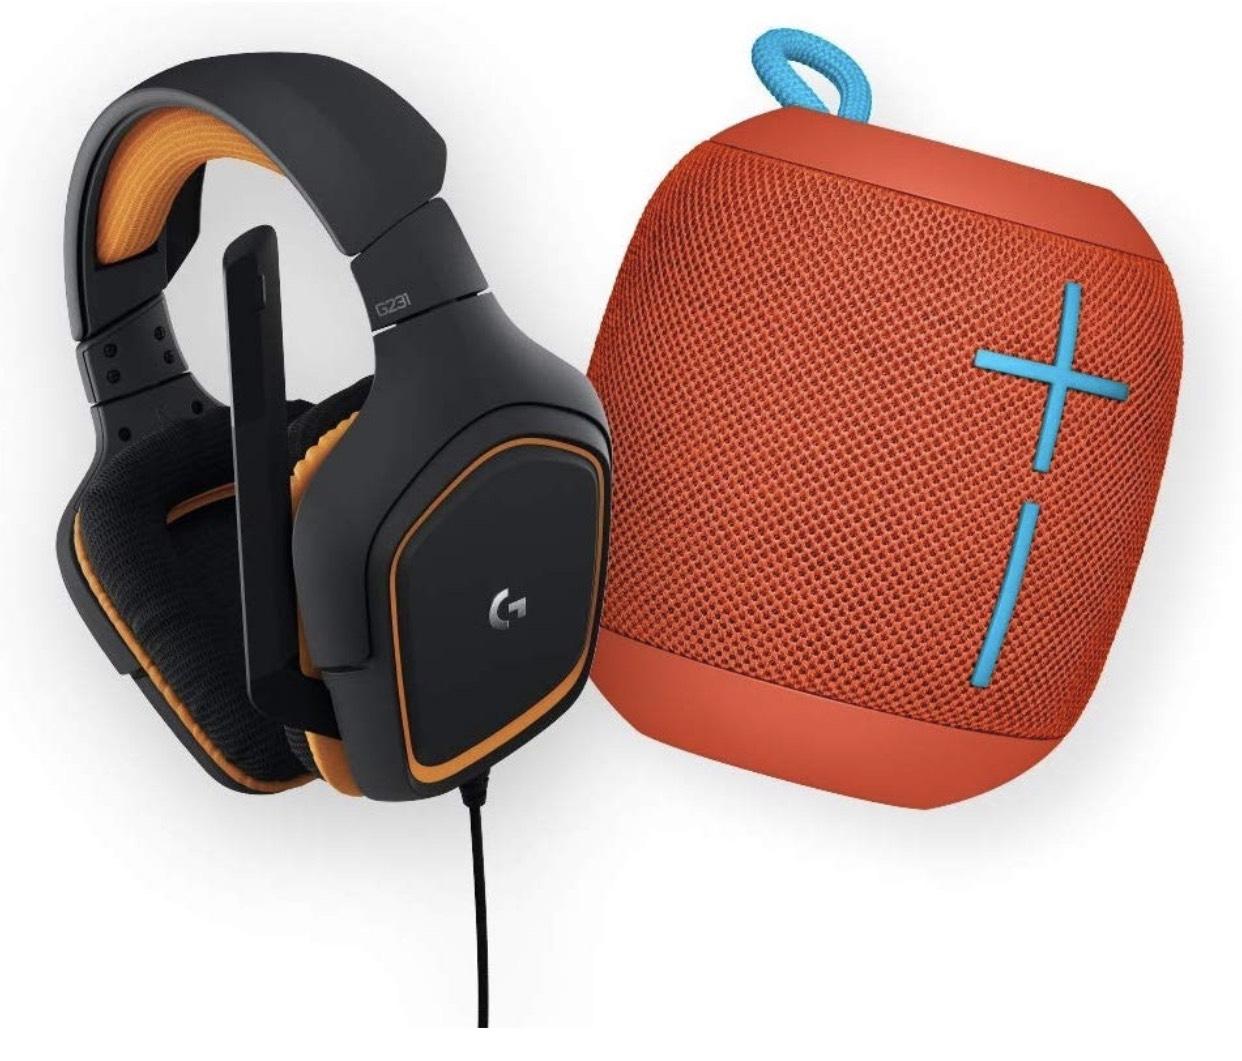 Ultimate Ears WonderBoom Bluetooth Lautsprecher + Logitech G231 Prodigy Headset für 77,65€